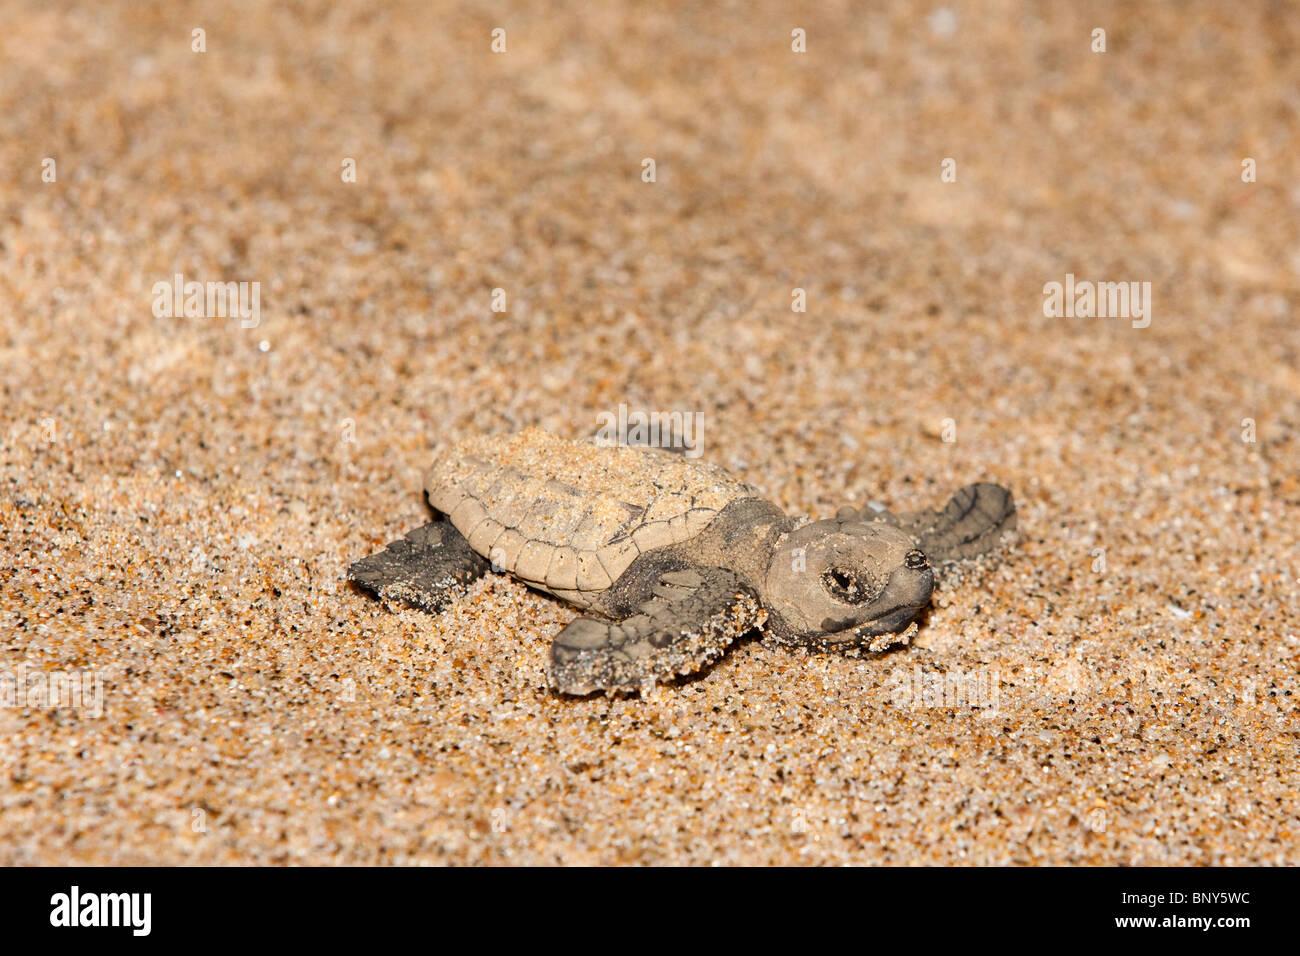 Loggerhead turtle hatchling, Caretta caretta, moving from nest to sea at night, Banga Nek, Kwazulu Natal, South - Stock Image